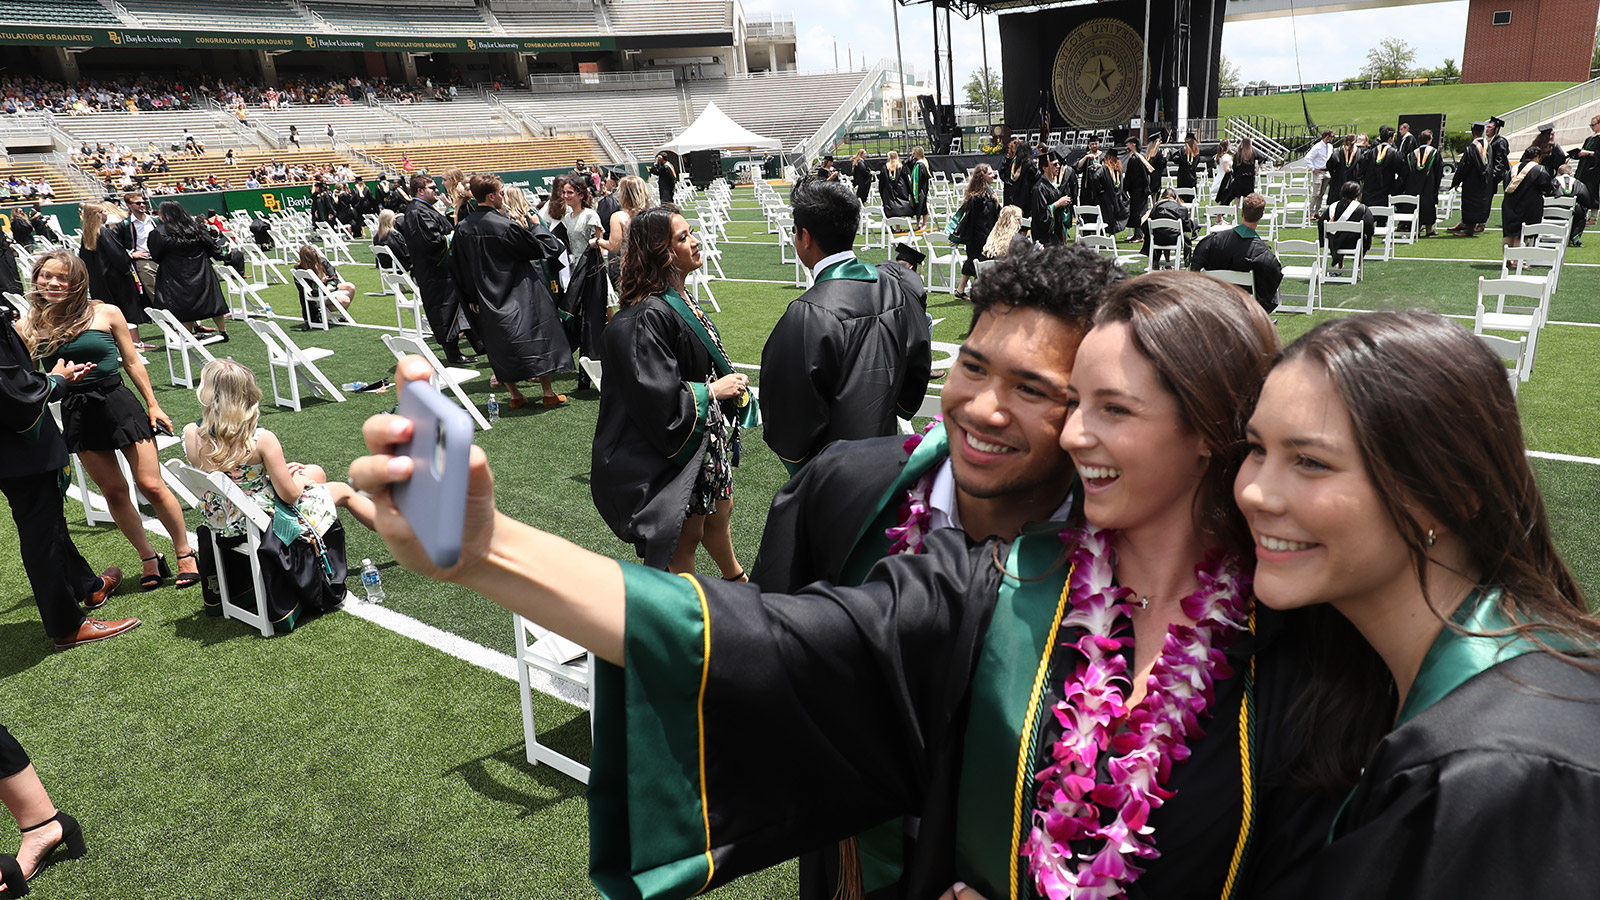 Sic 'em Graduates!